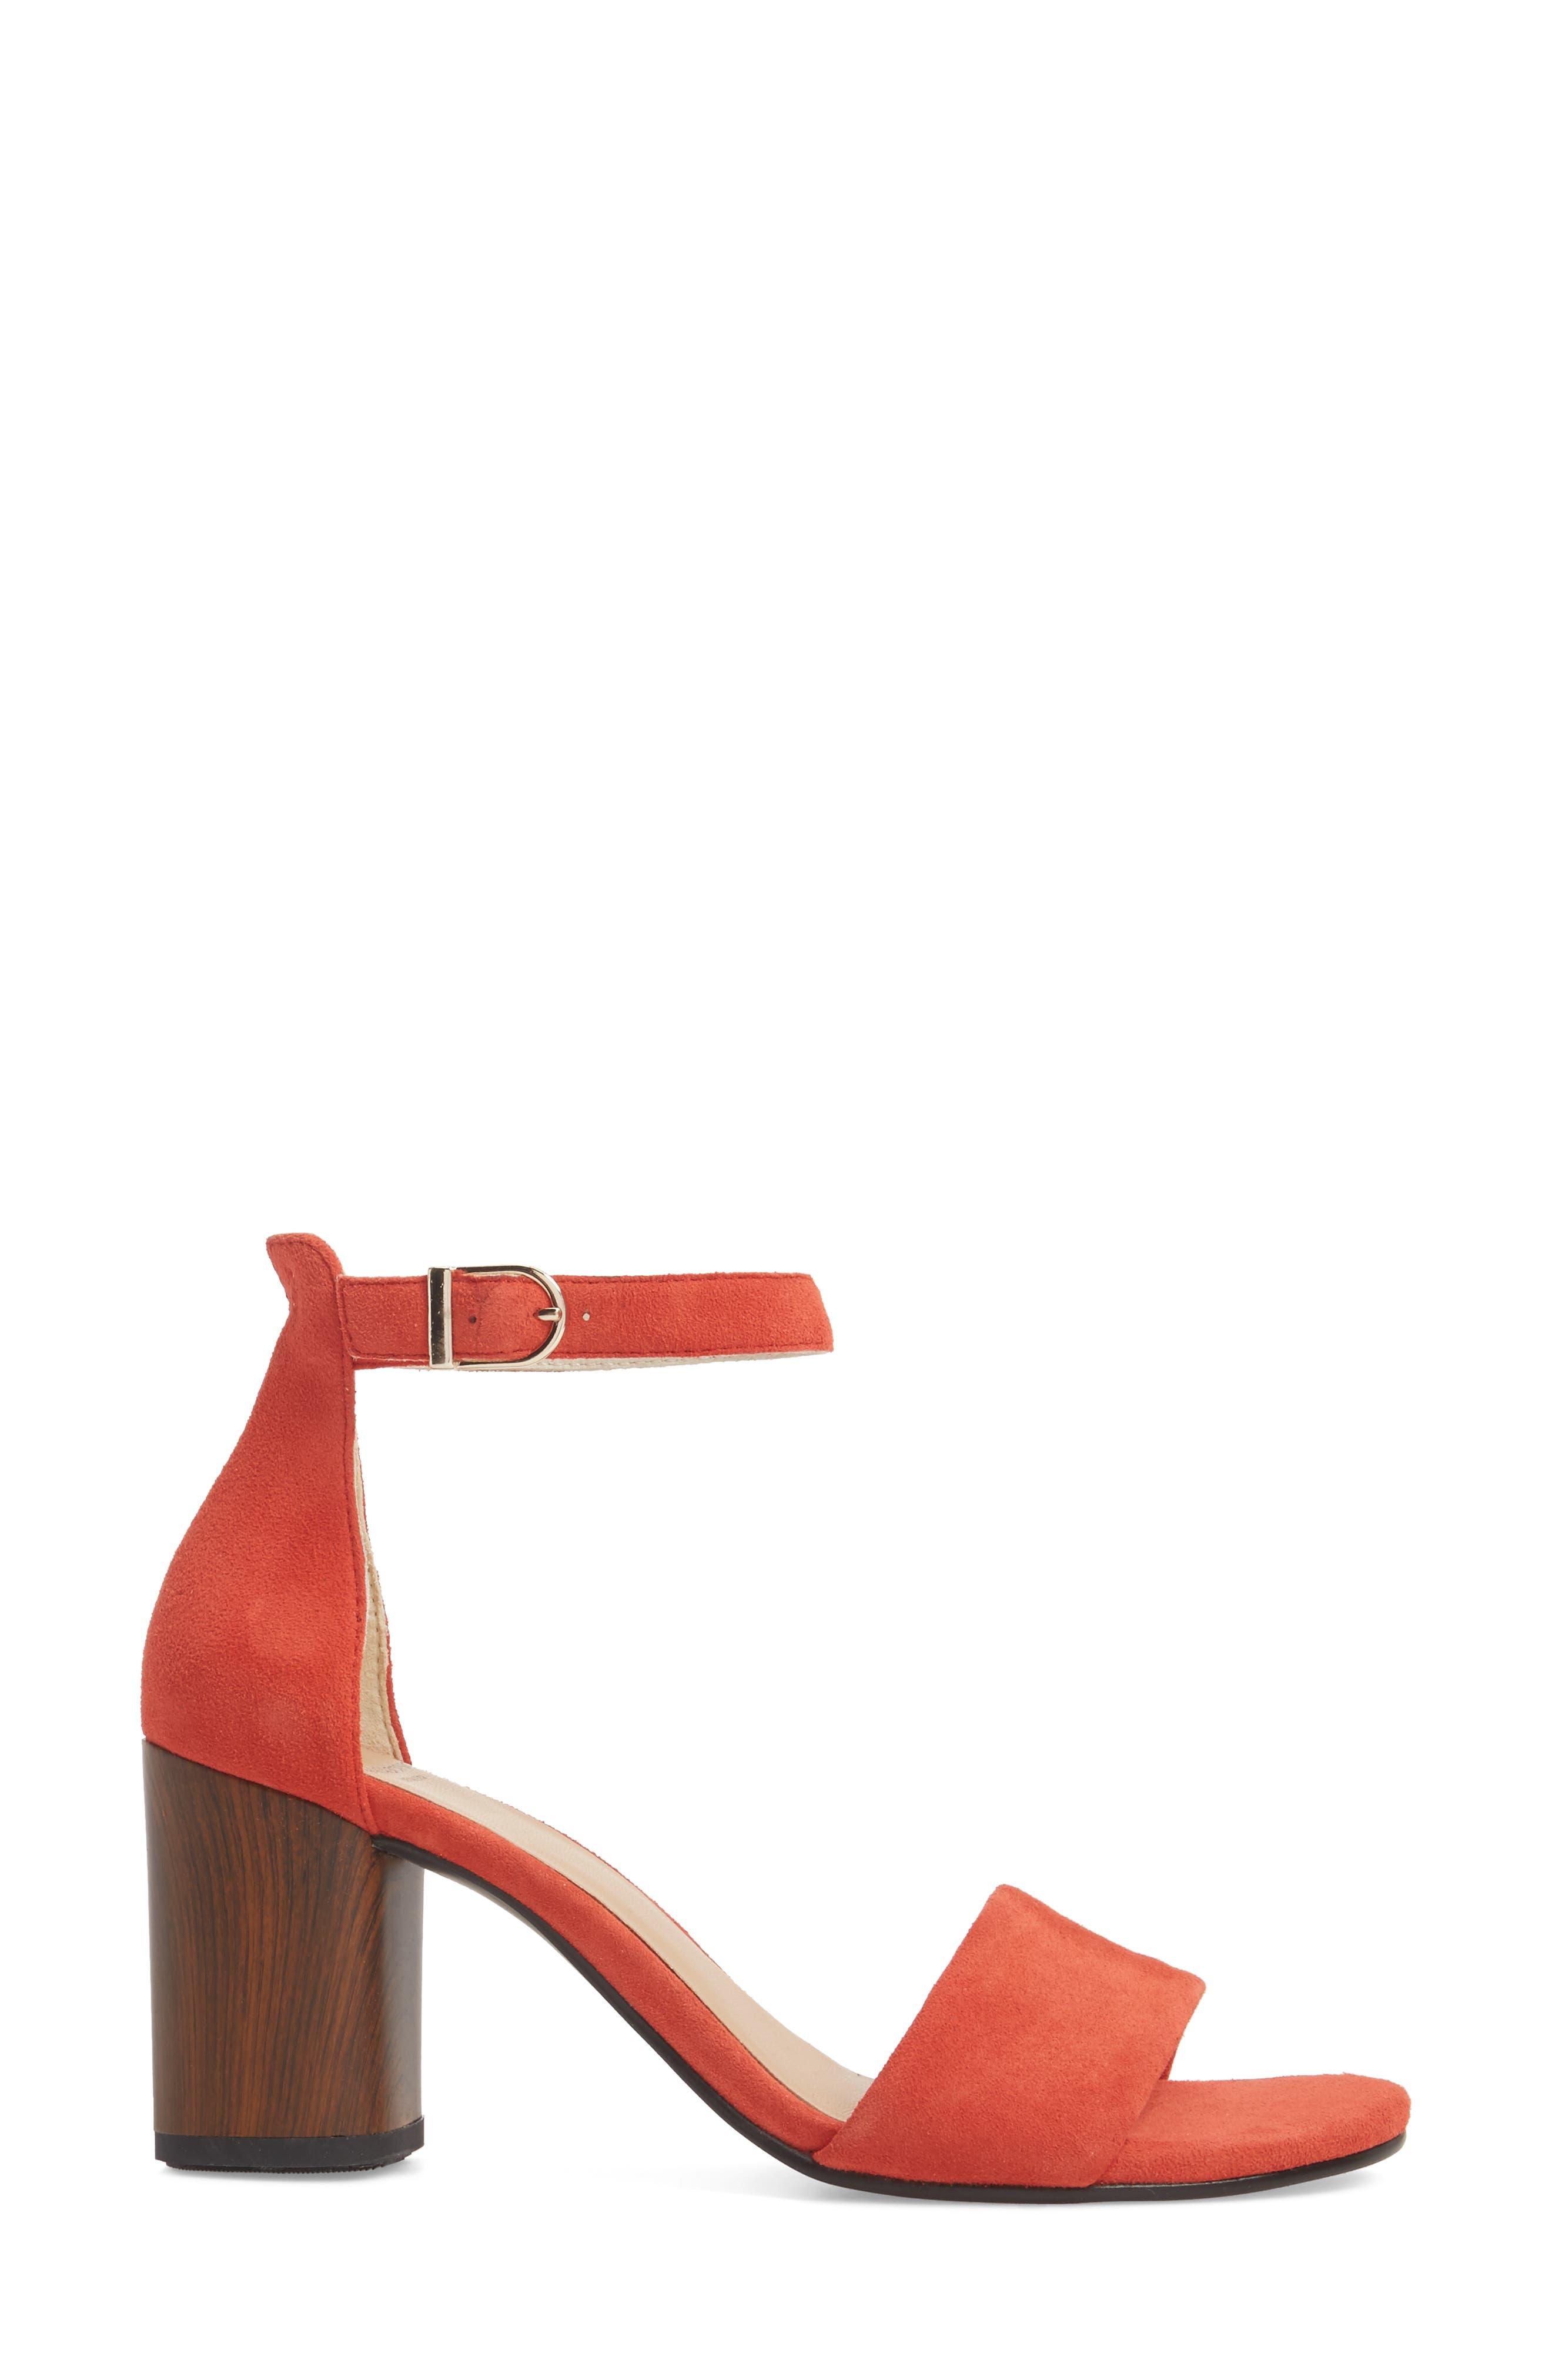 Carol Ankle Strap Sandal,                             Alternate thumbnail 3, color,                             Coral Suede